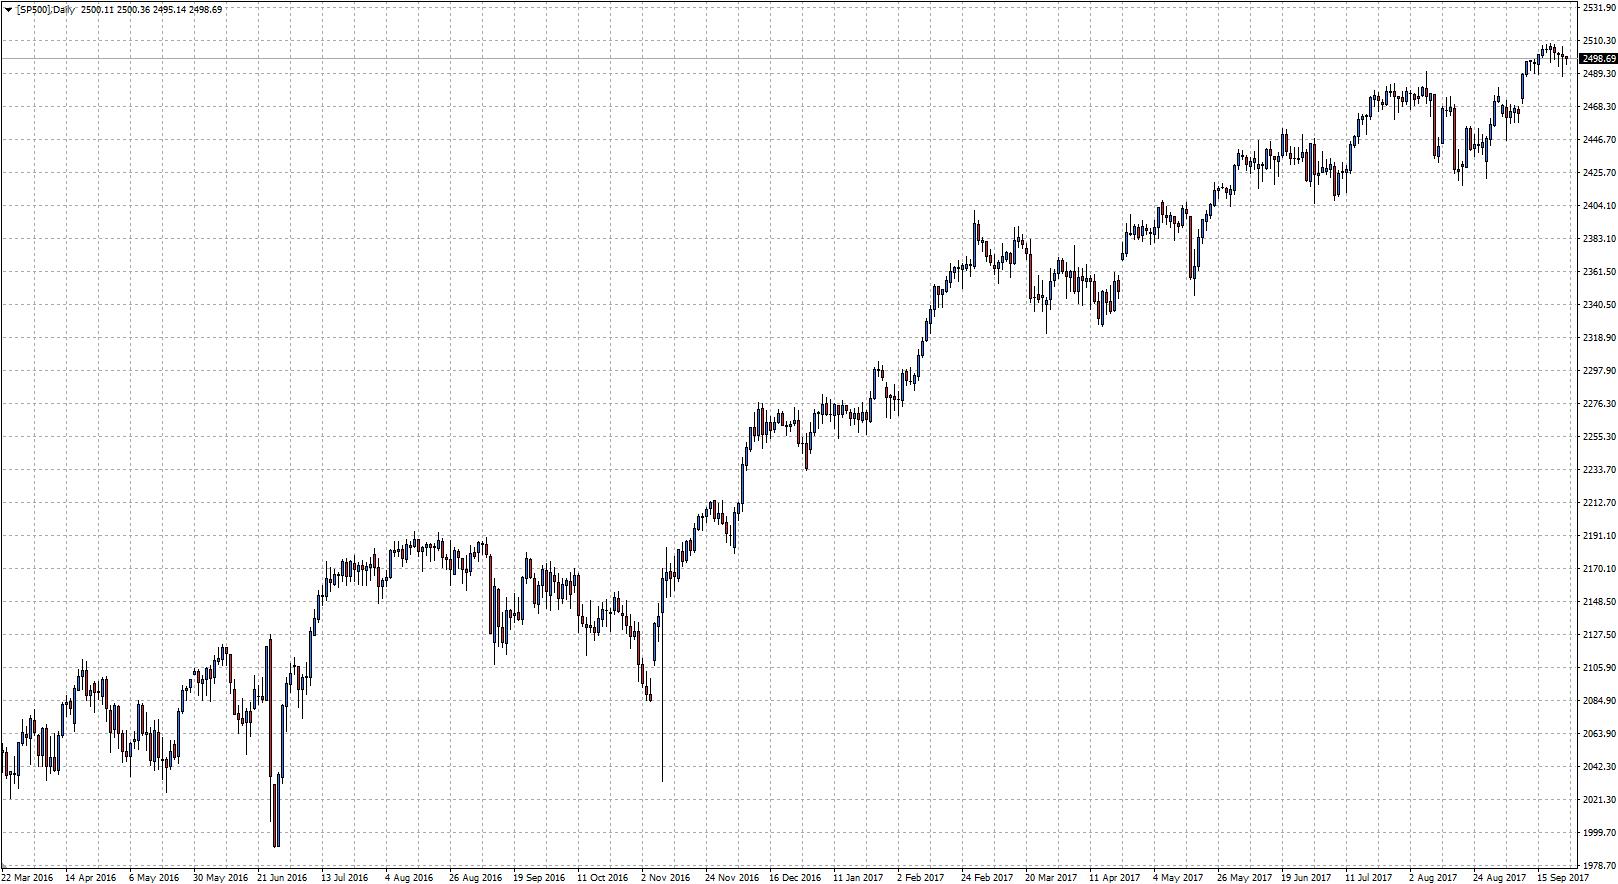 Tendencia principal de trading (largo plazo)